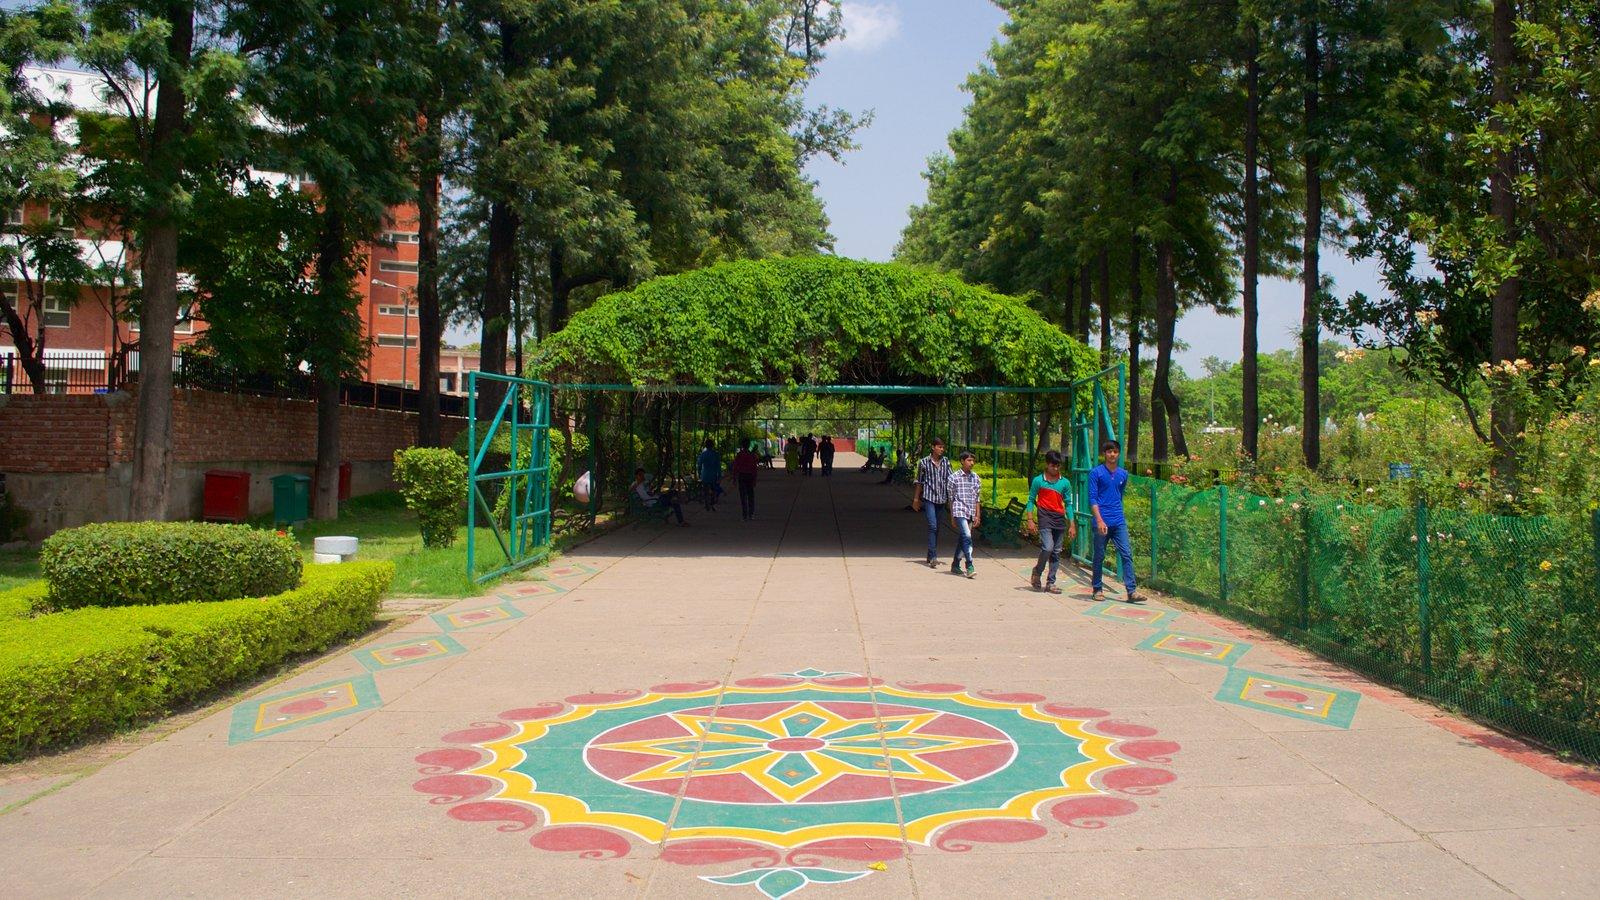 Zakir Rose Garden Pictures View Photos And Images Of Zakir Rose Garden